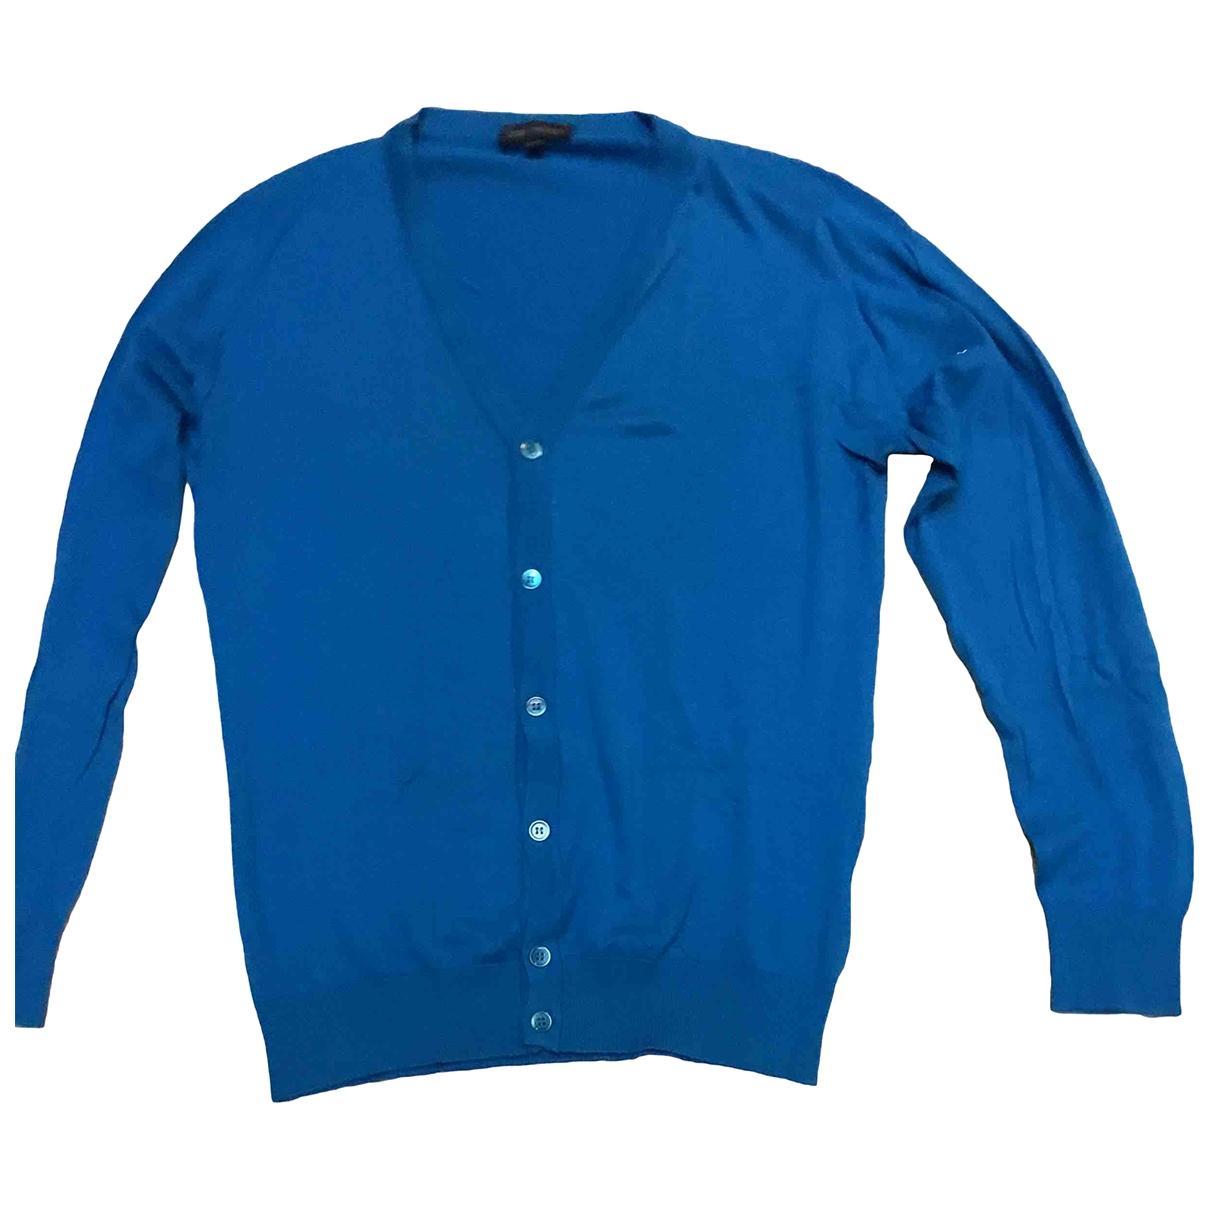 John Smedley \N Blue Cotton Knitwear & Sweatshirts for Men S International